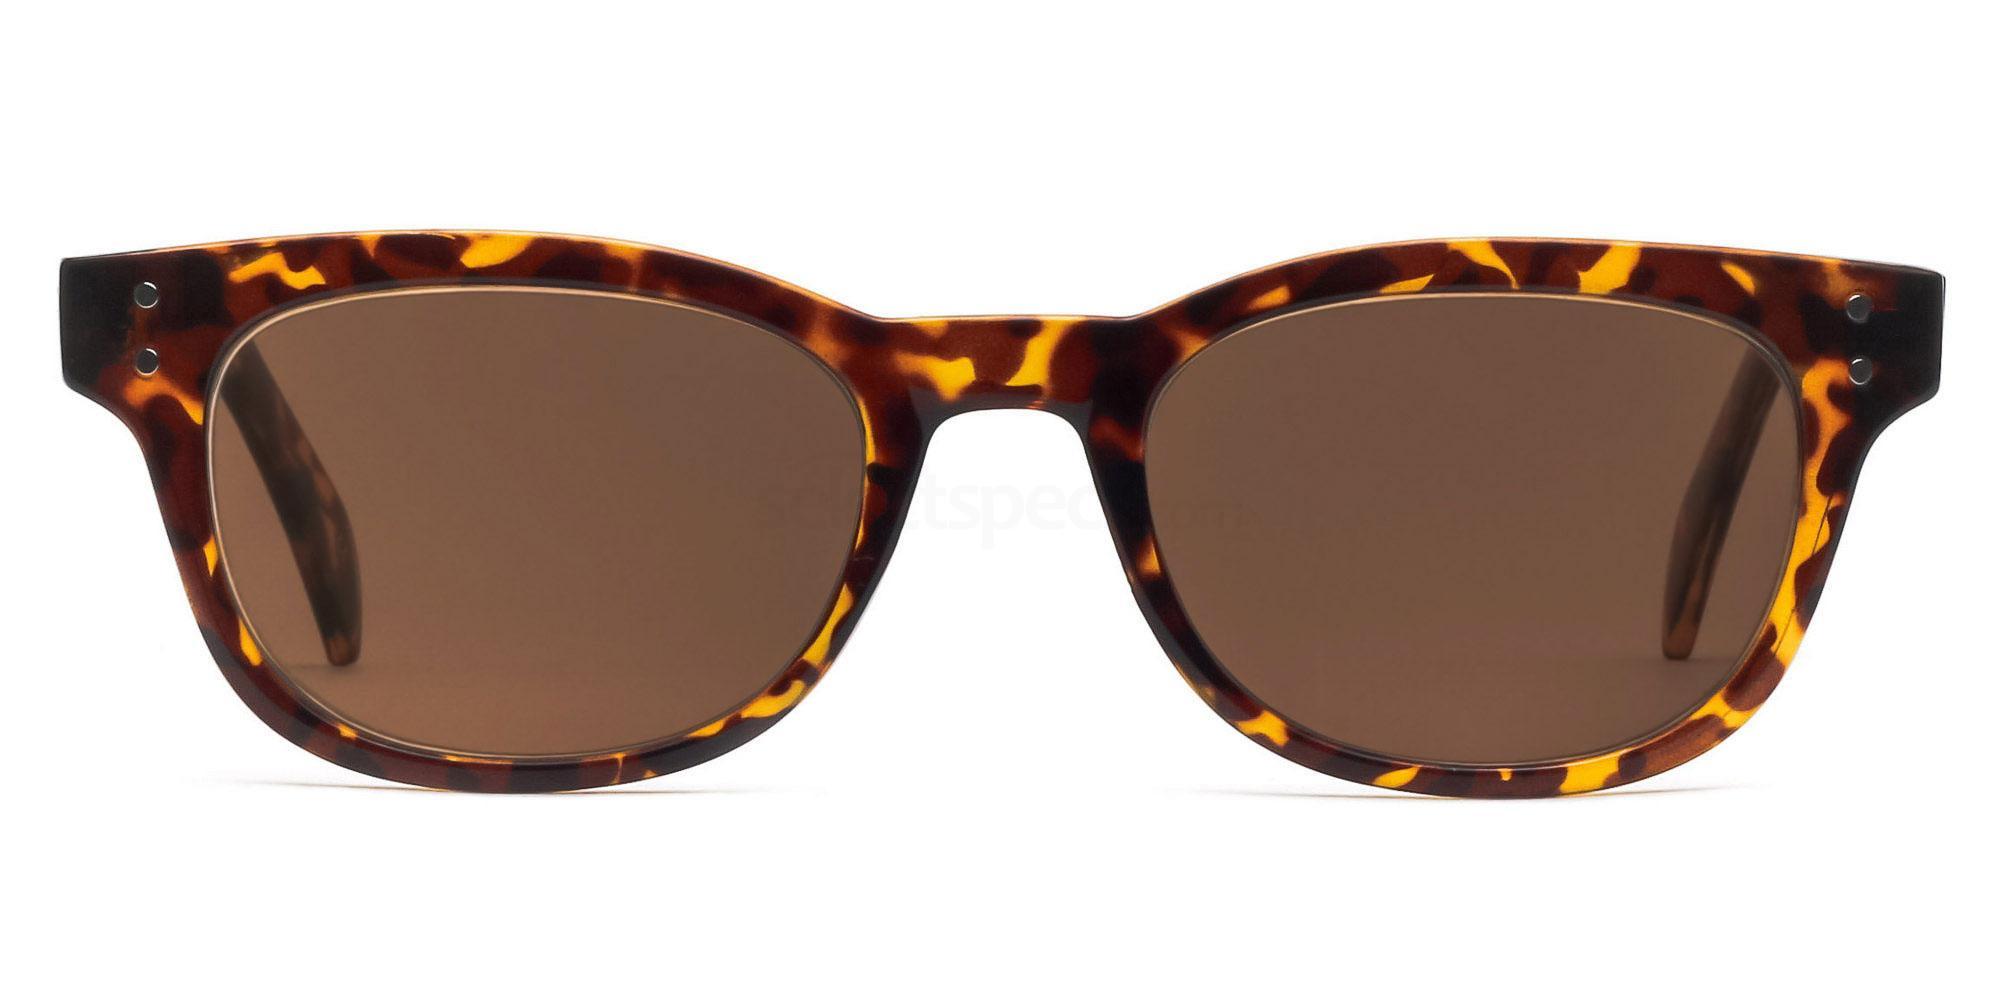 C04 Dark Brown P2249 Havana (Sunglasses) Sunglasses, Savannah